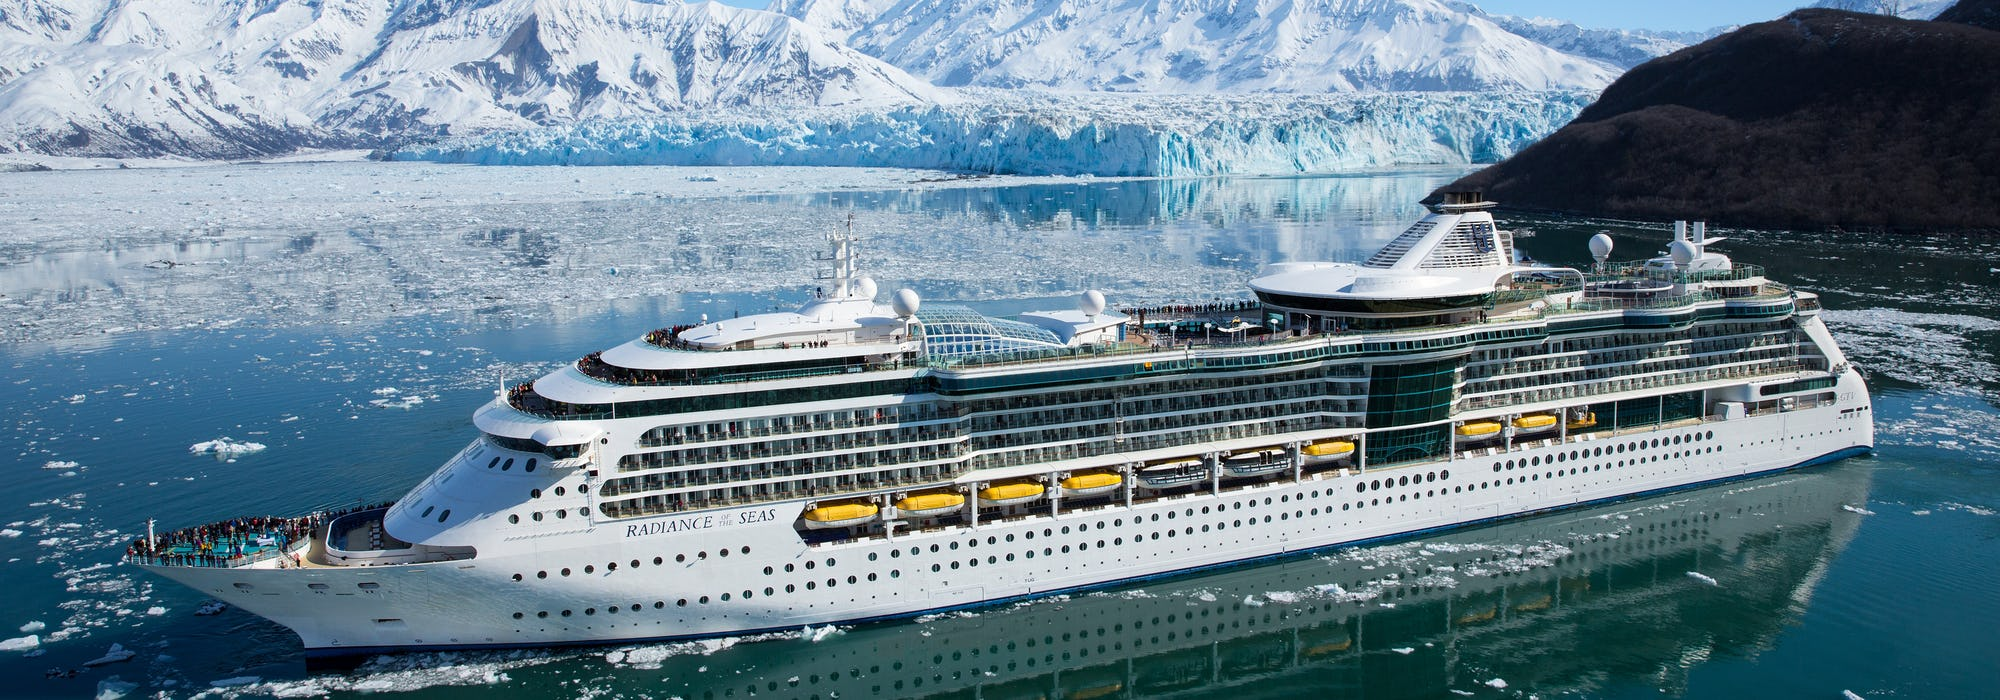 Radiance of the Seas kryssar sig fram i Alaskas vackra natur.